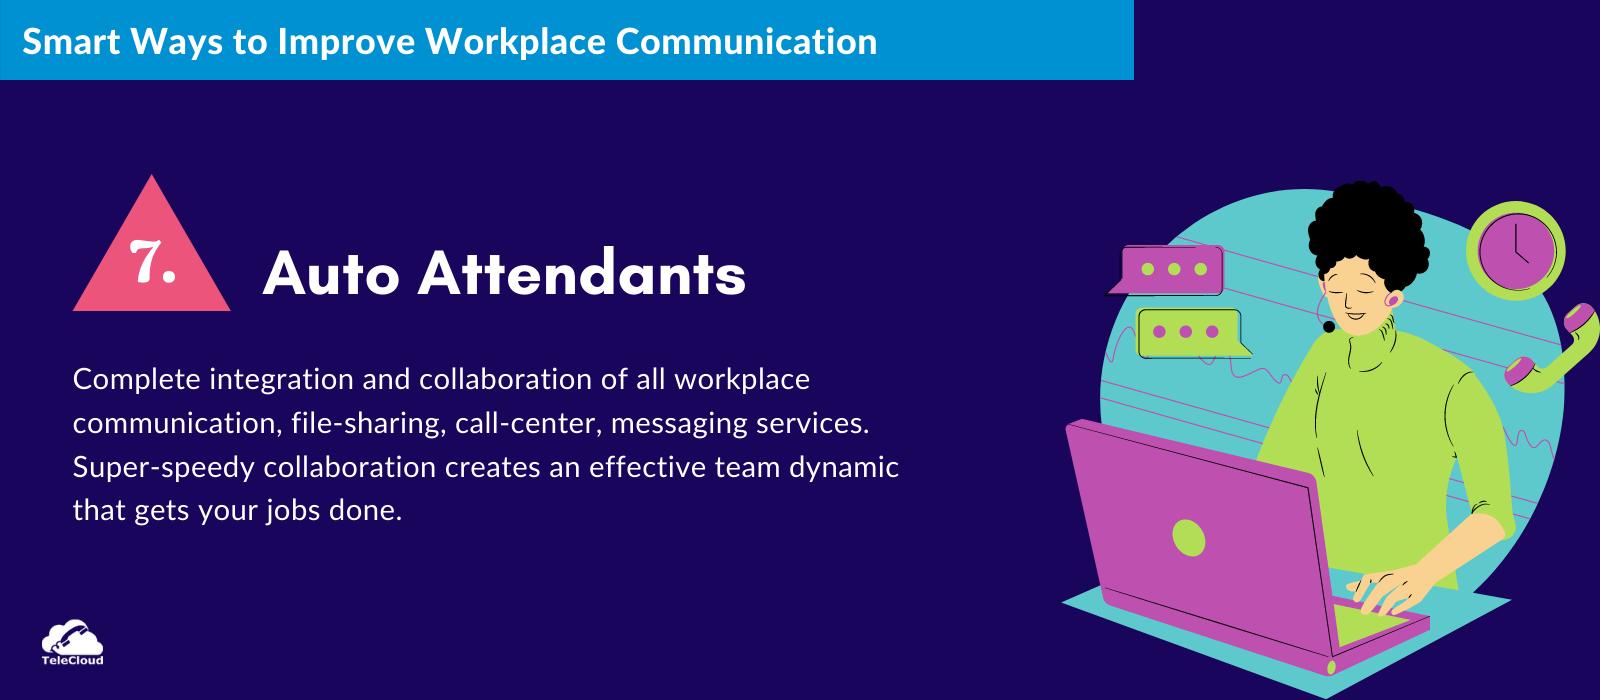 Auto Attendants to improve business communication - TeleCloud